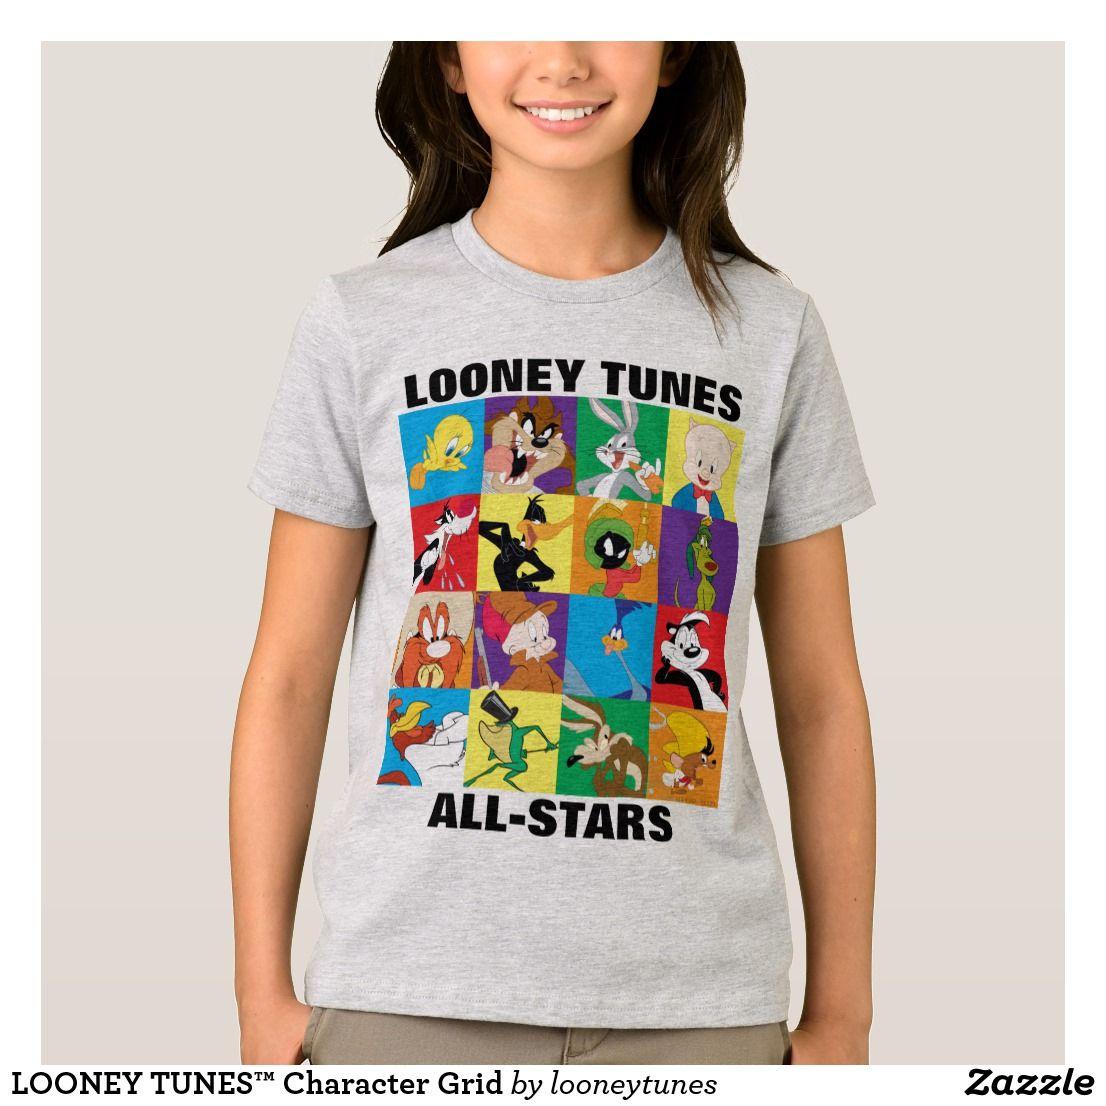 LOONEY TUNES™ Character Grid TShirt